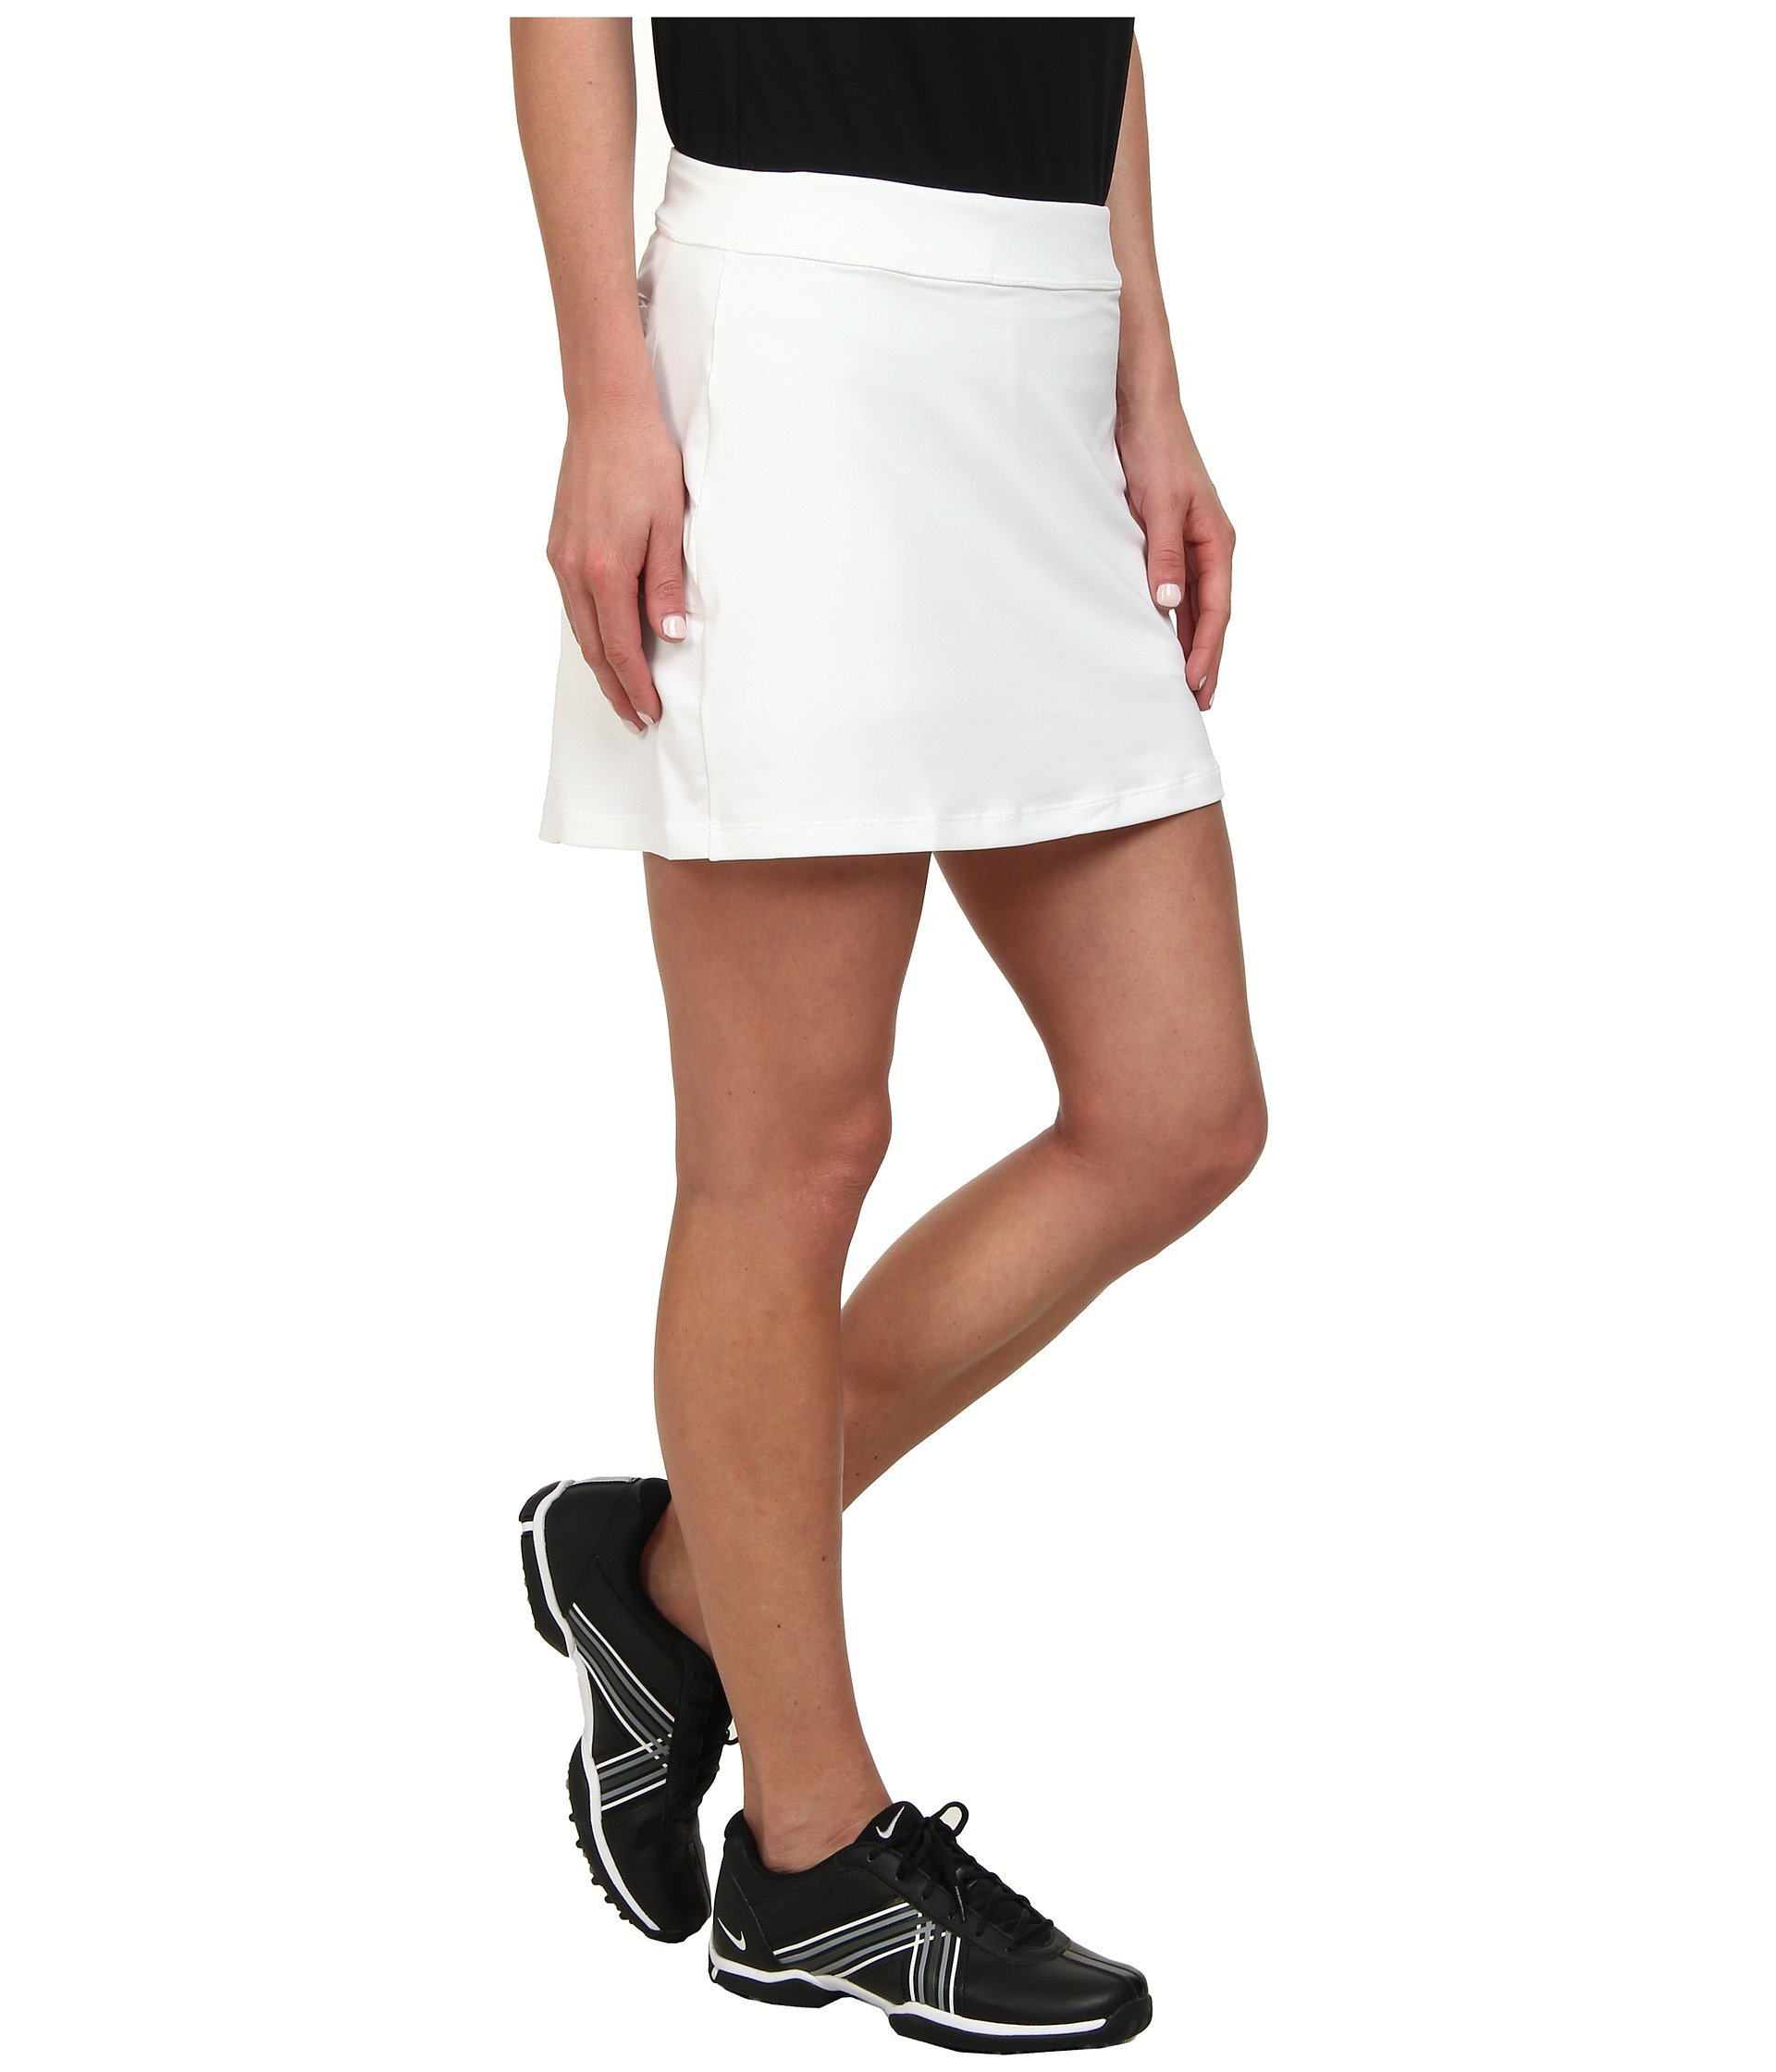 NIKE 14.5in Dry Knit Print Golf Skort 2017 Women, White, Medium